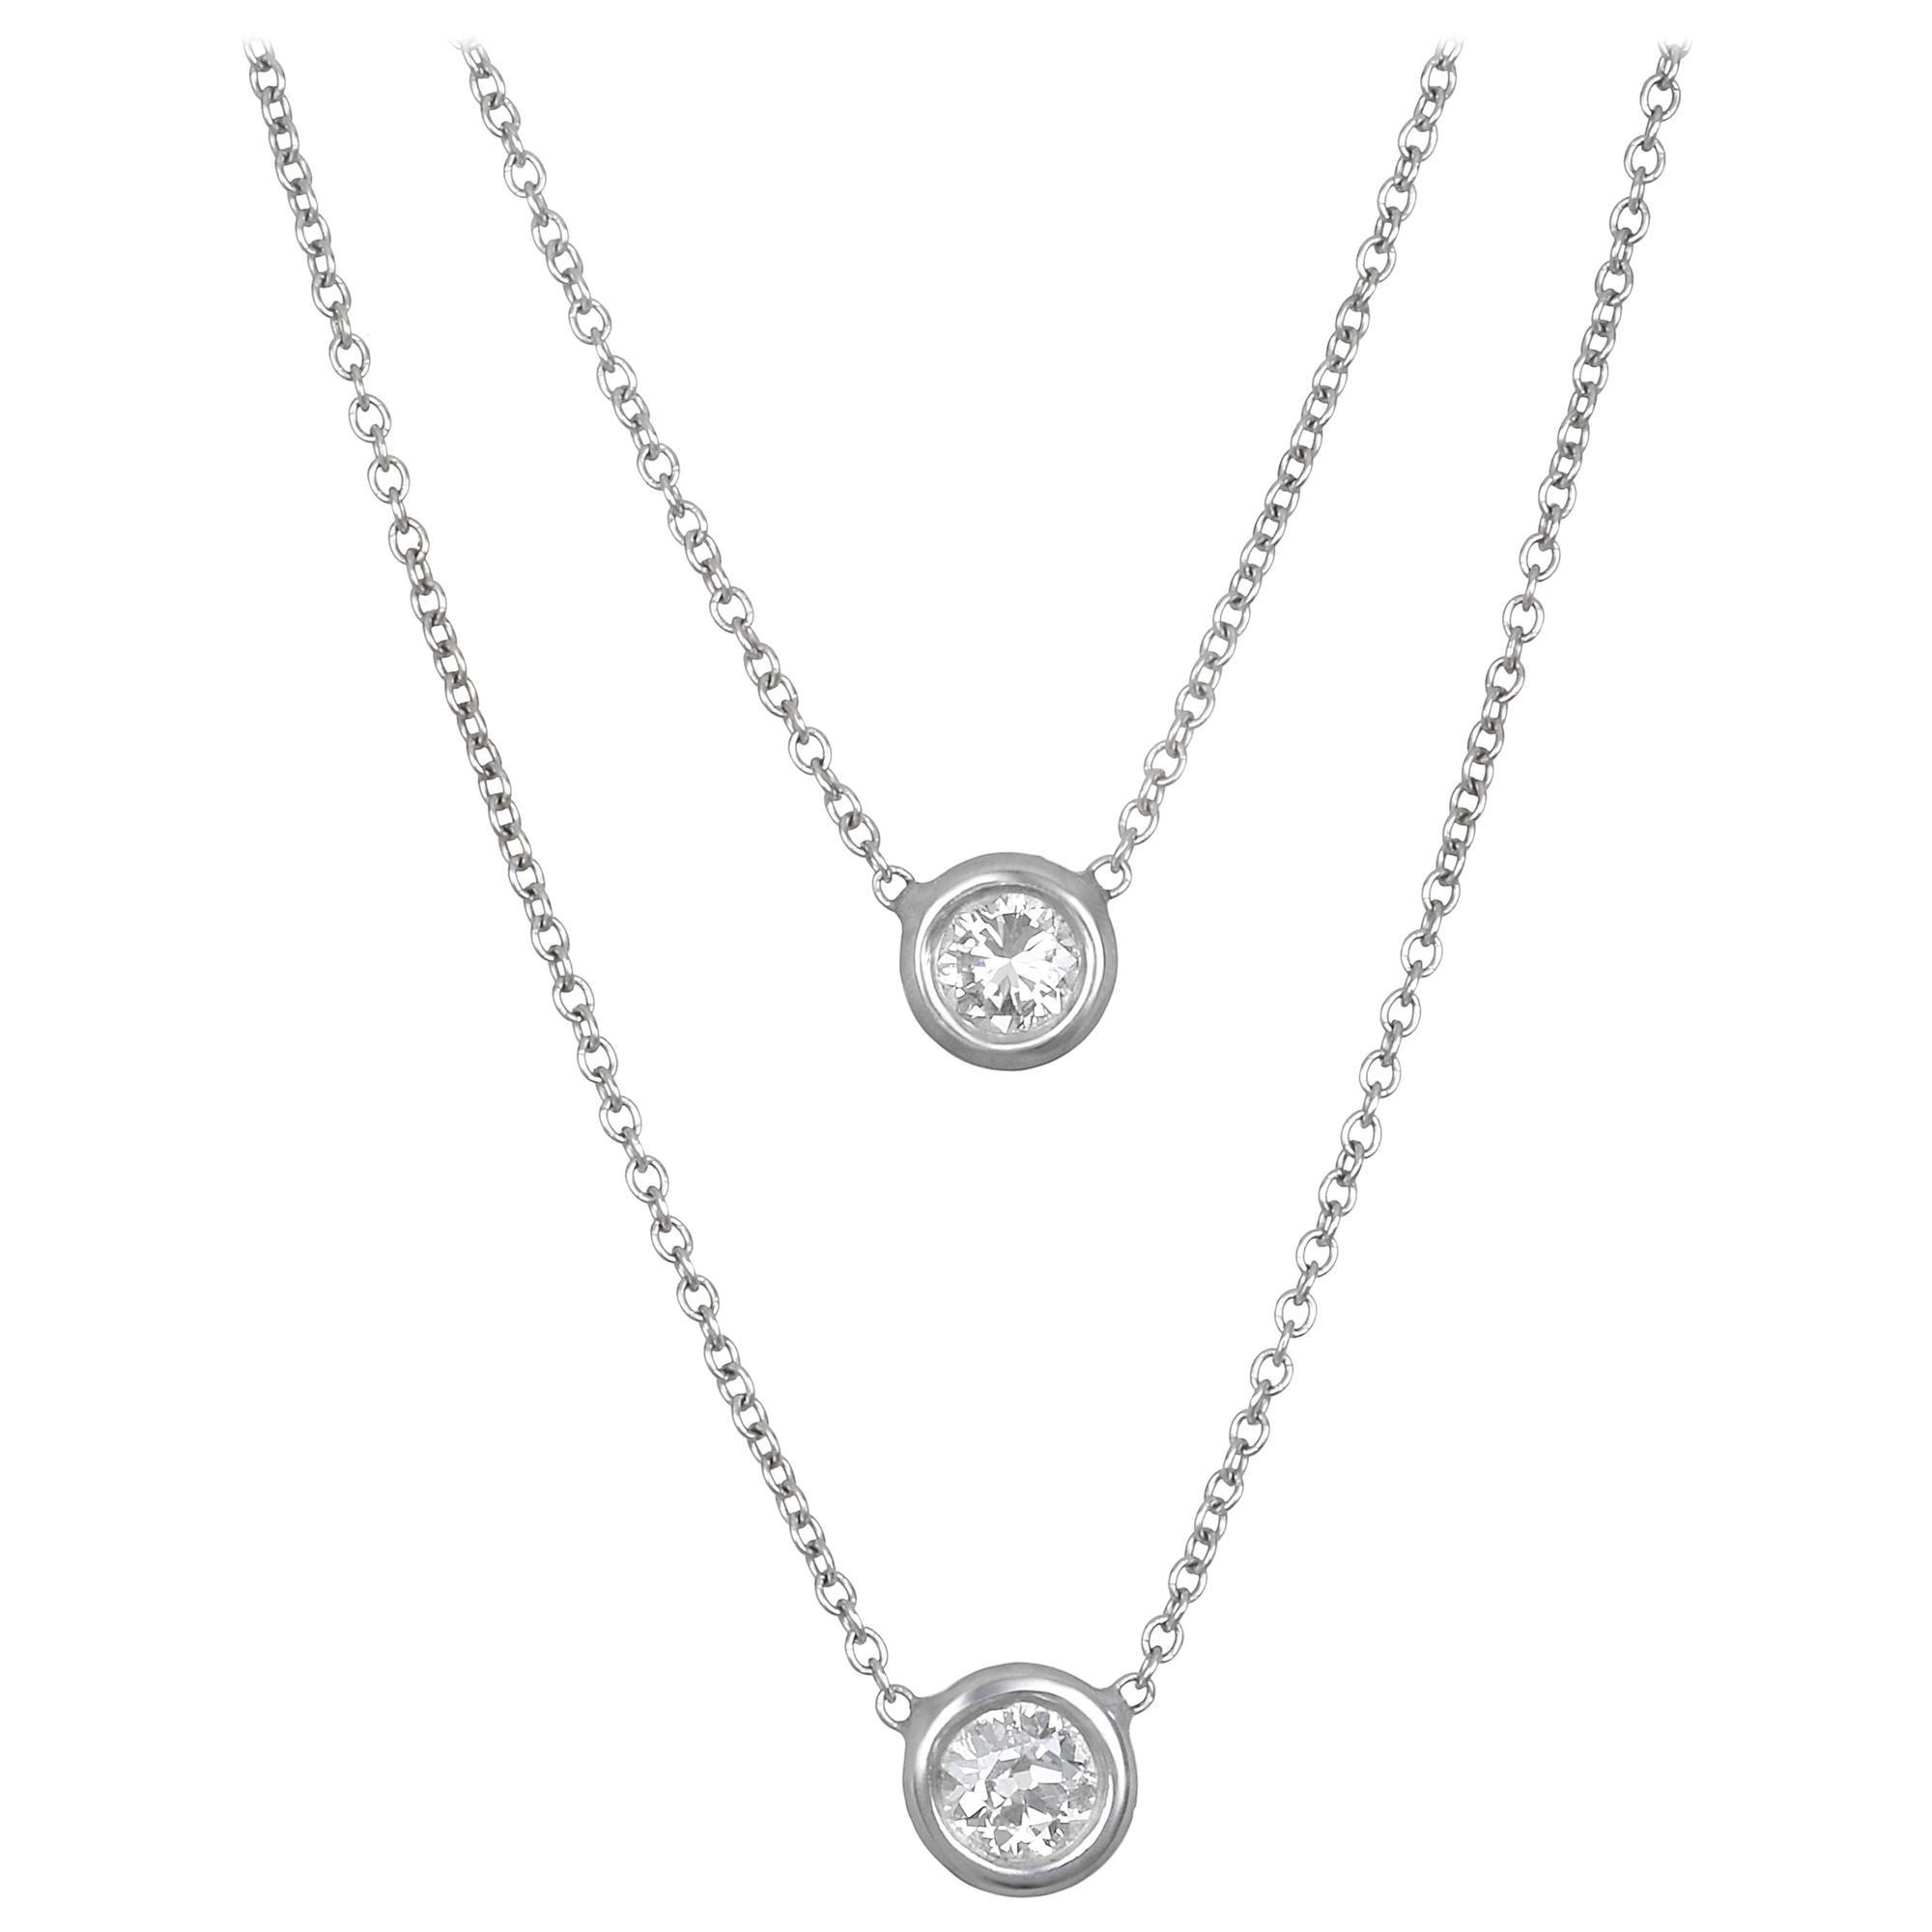 Faye Kim 18 Karat White Gold Diamond Necklace